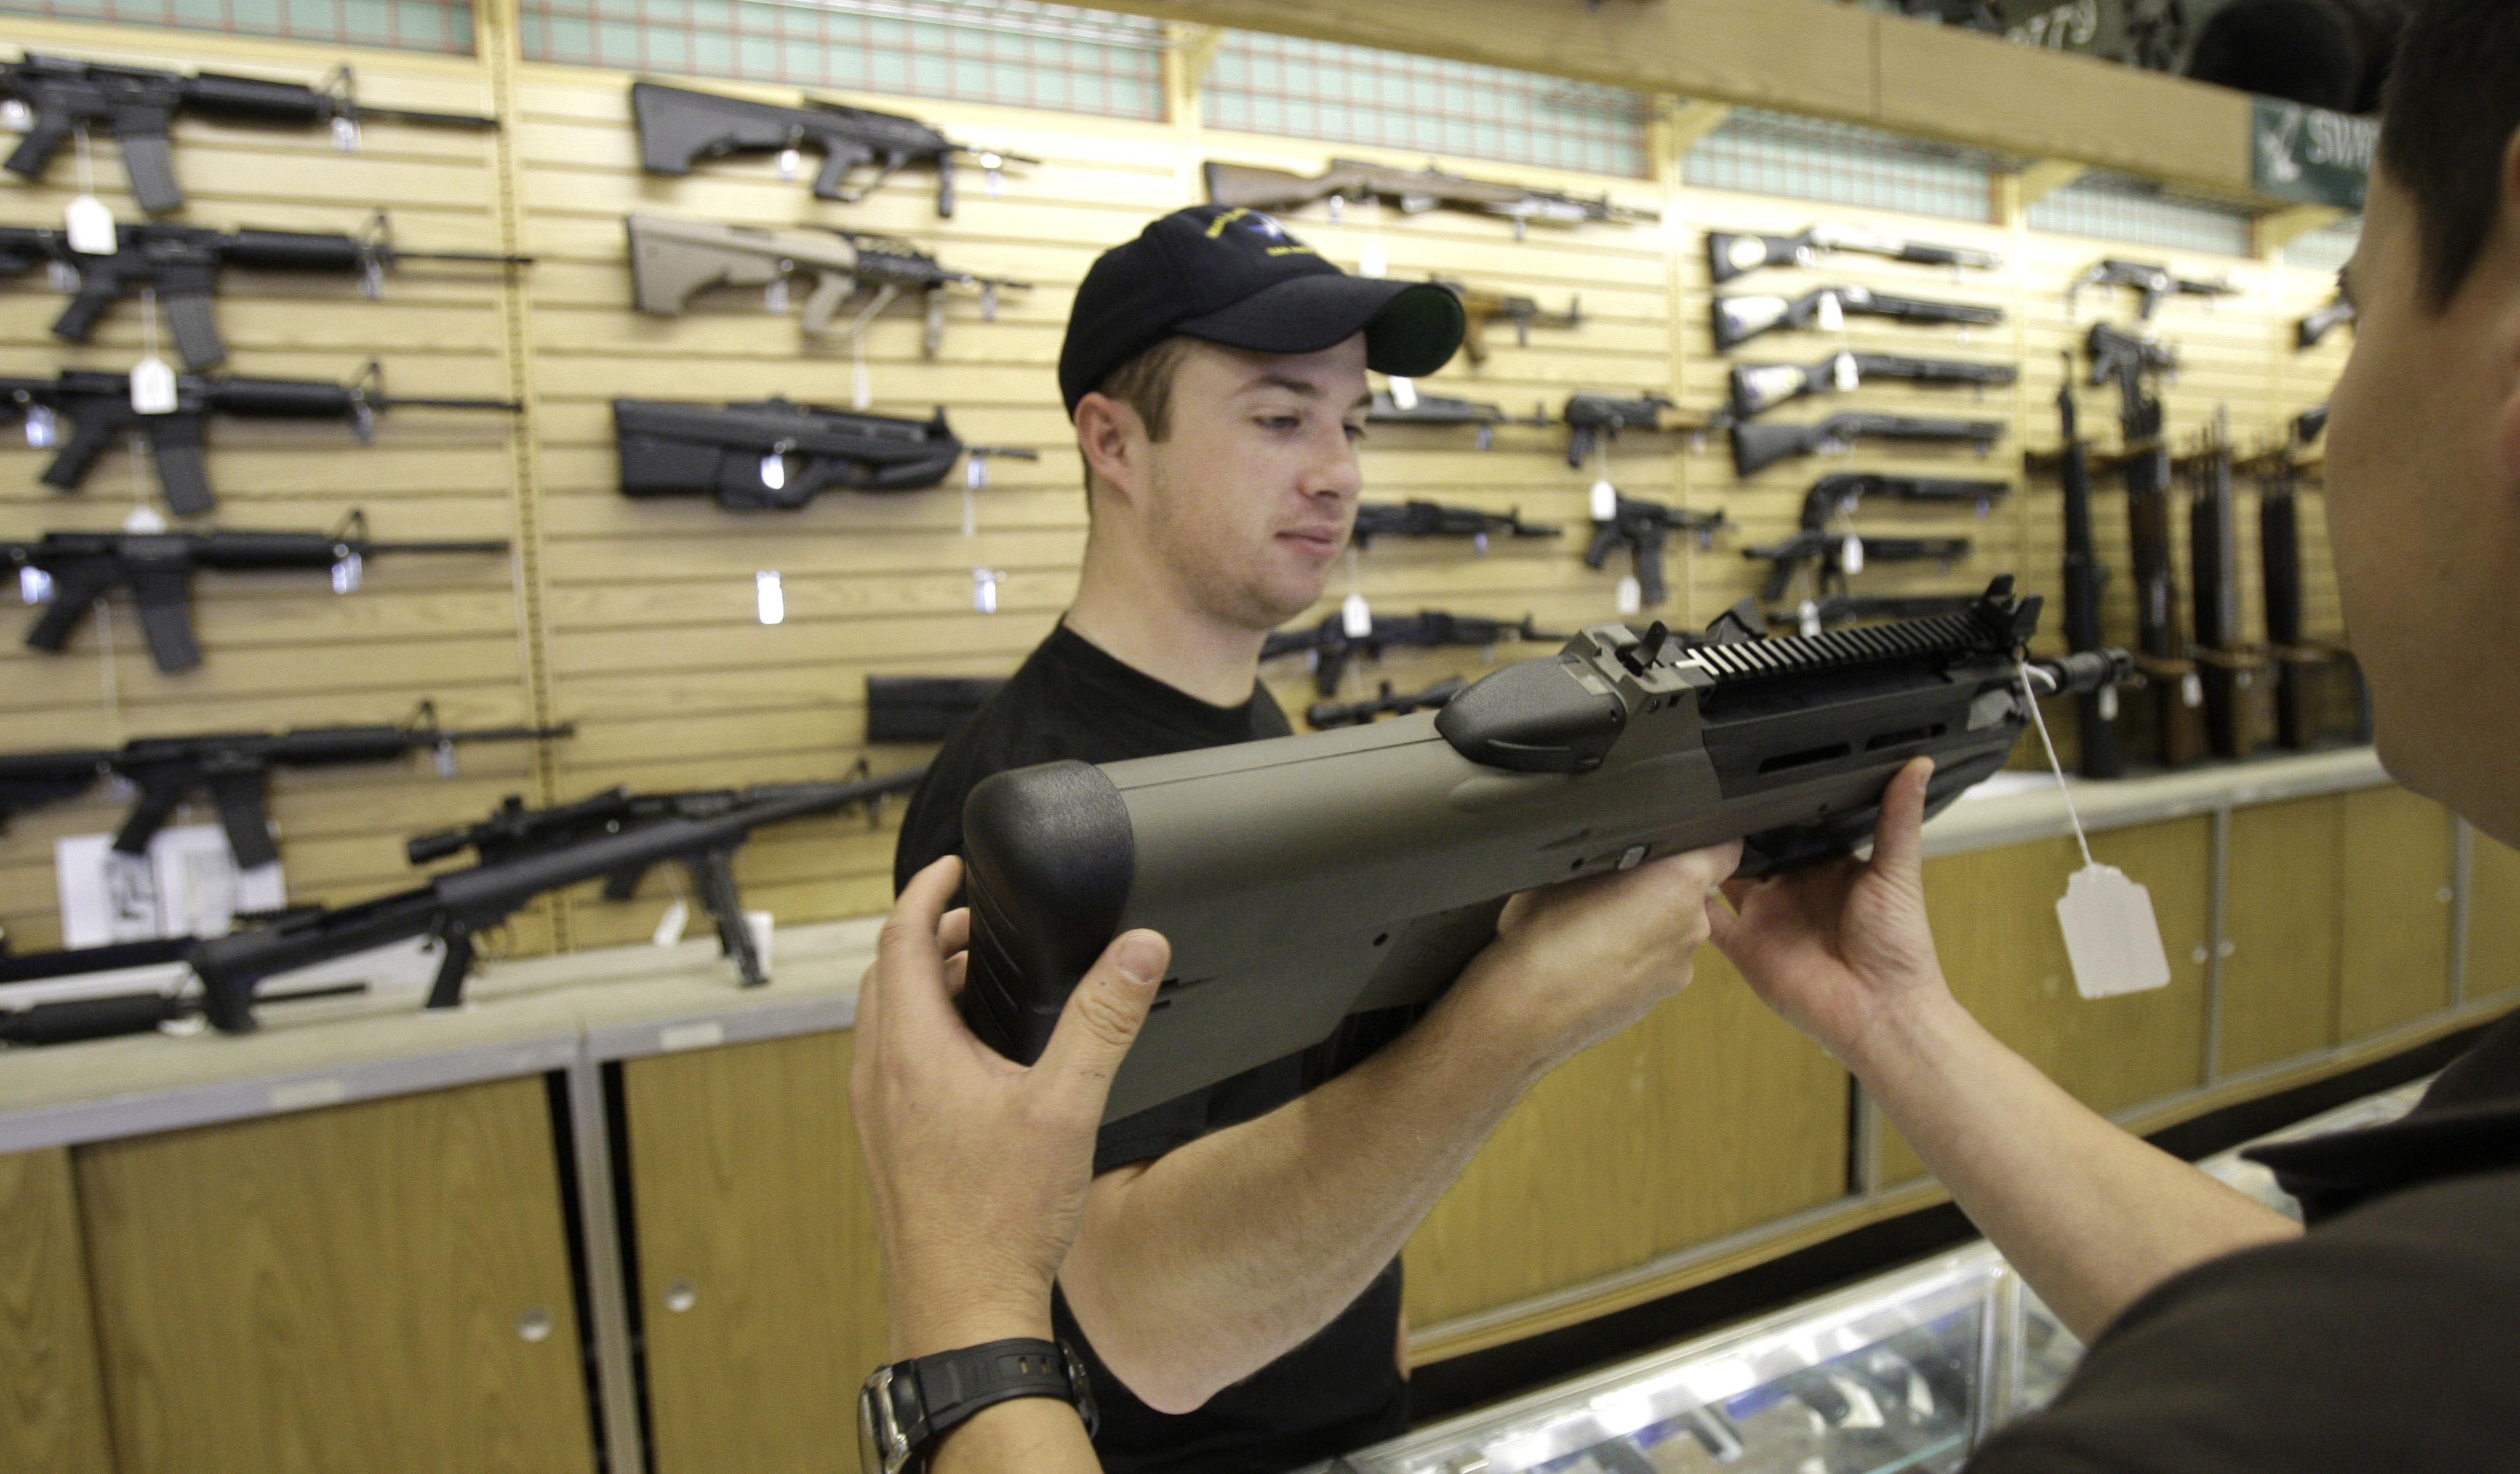 gun laws in america essay